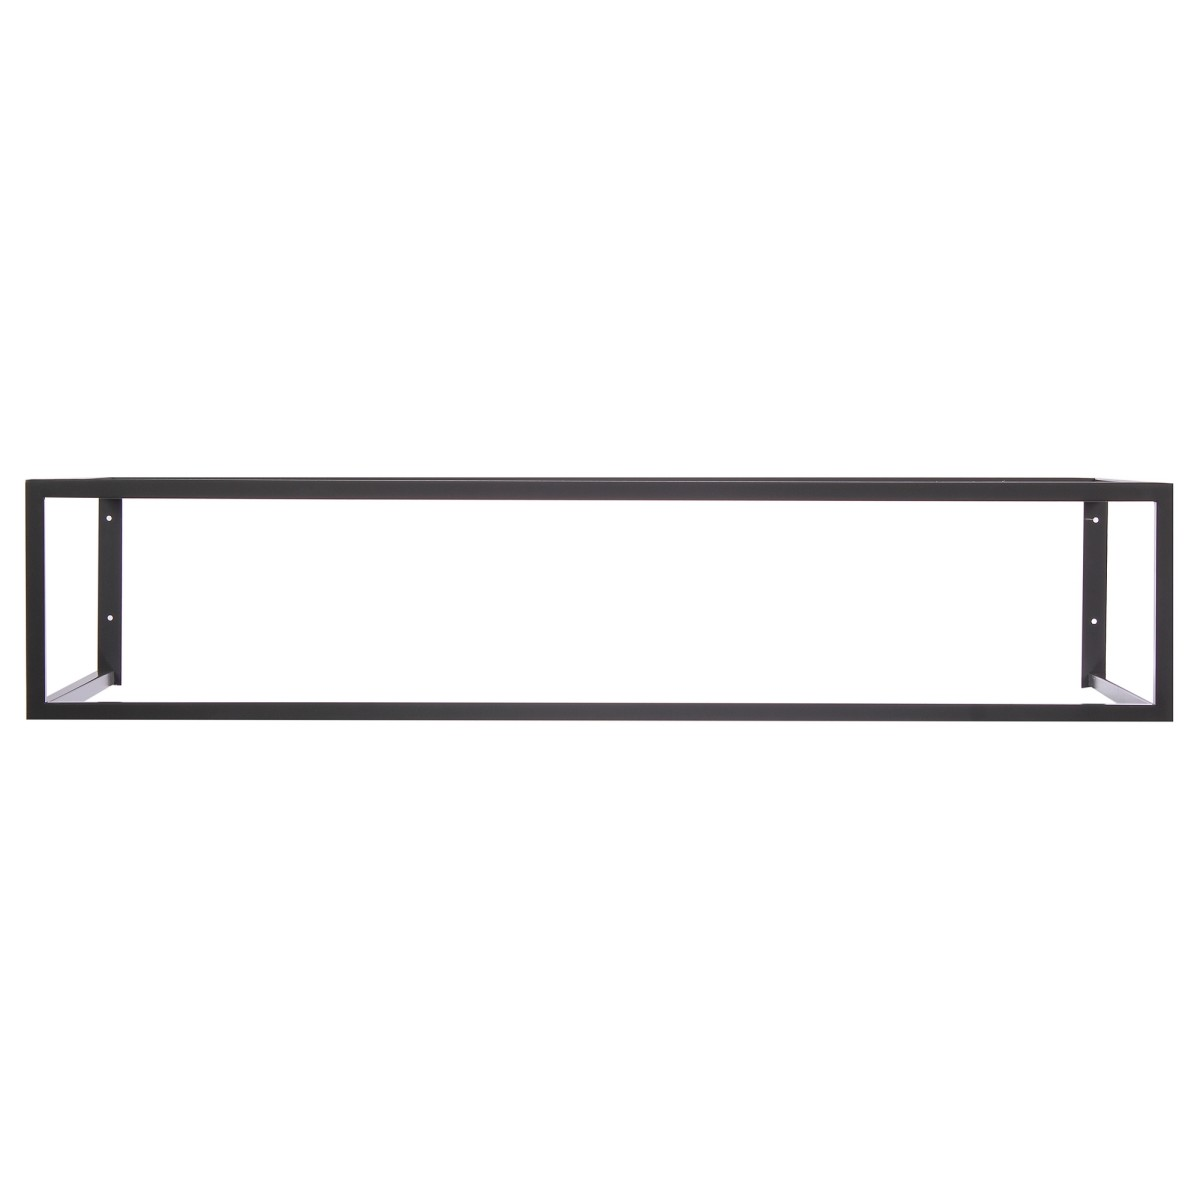 Кронштейн подвесной для столешницы 1195х450х250 см цвет серый